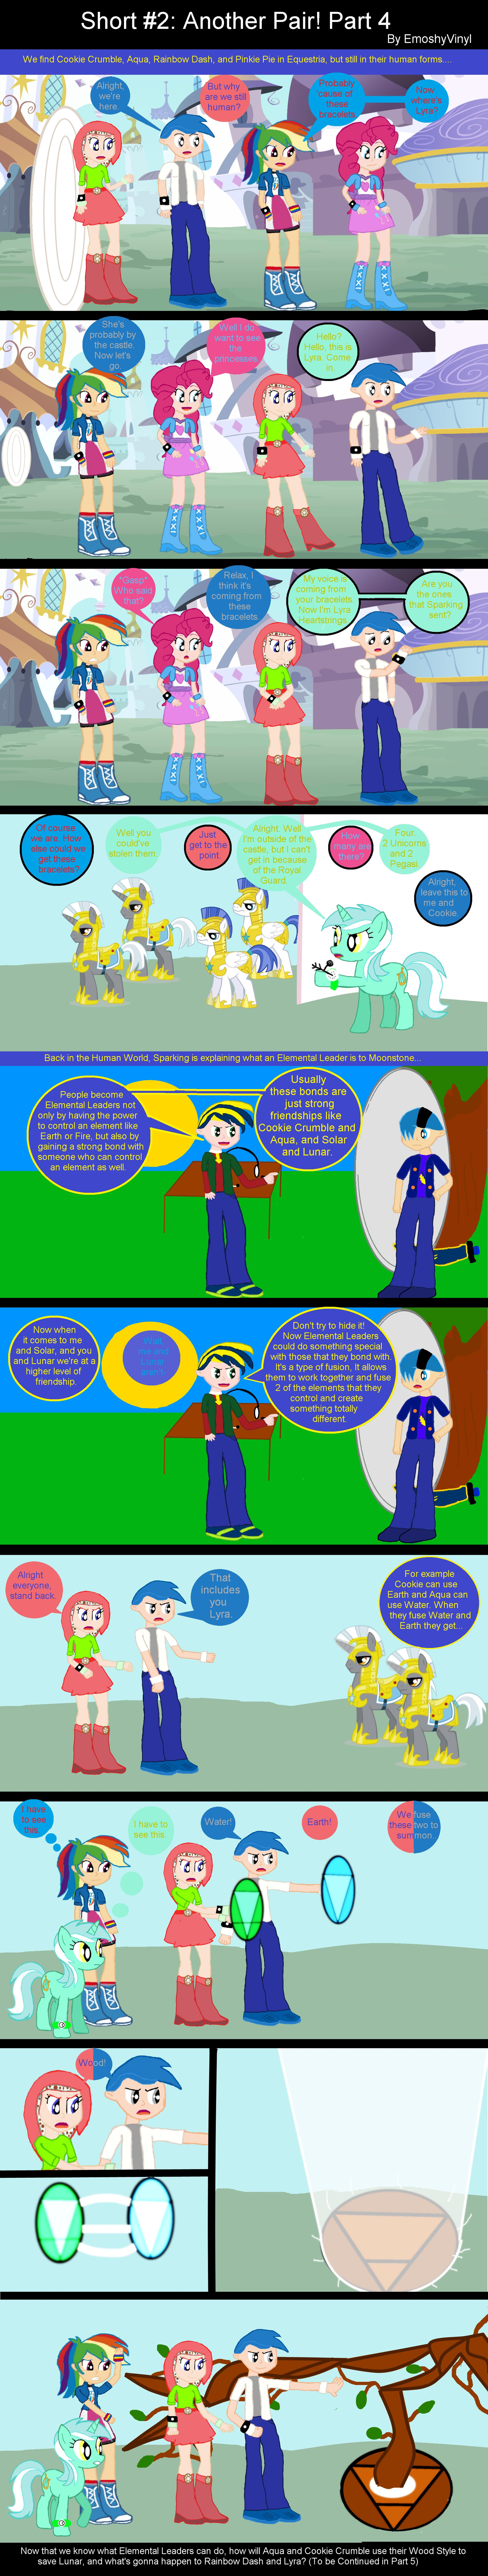 Short #2: Another Pair! Part 4 by EmoshyVinyl